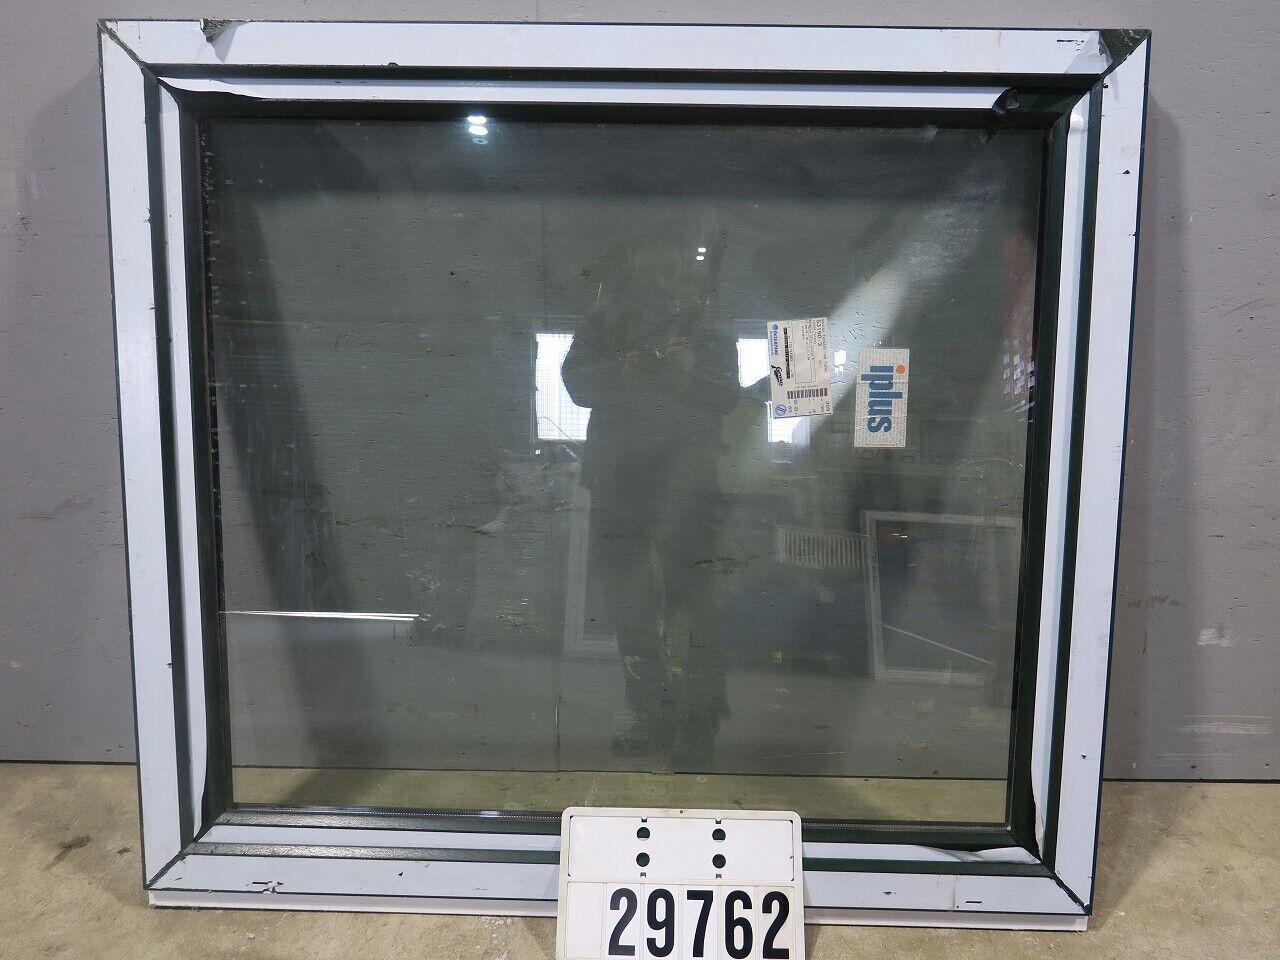 Fenster Kunststofffenster Dachfenster Kippfenster 1425x1260mm Din Links  29762